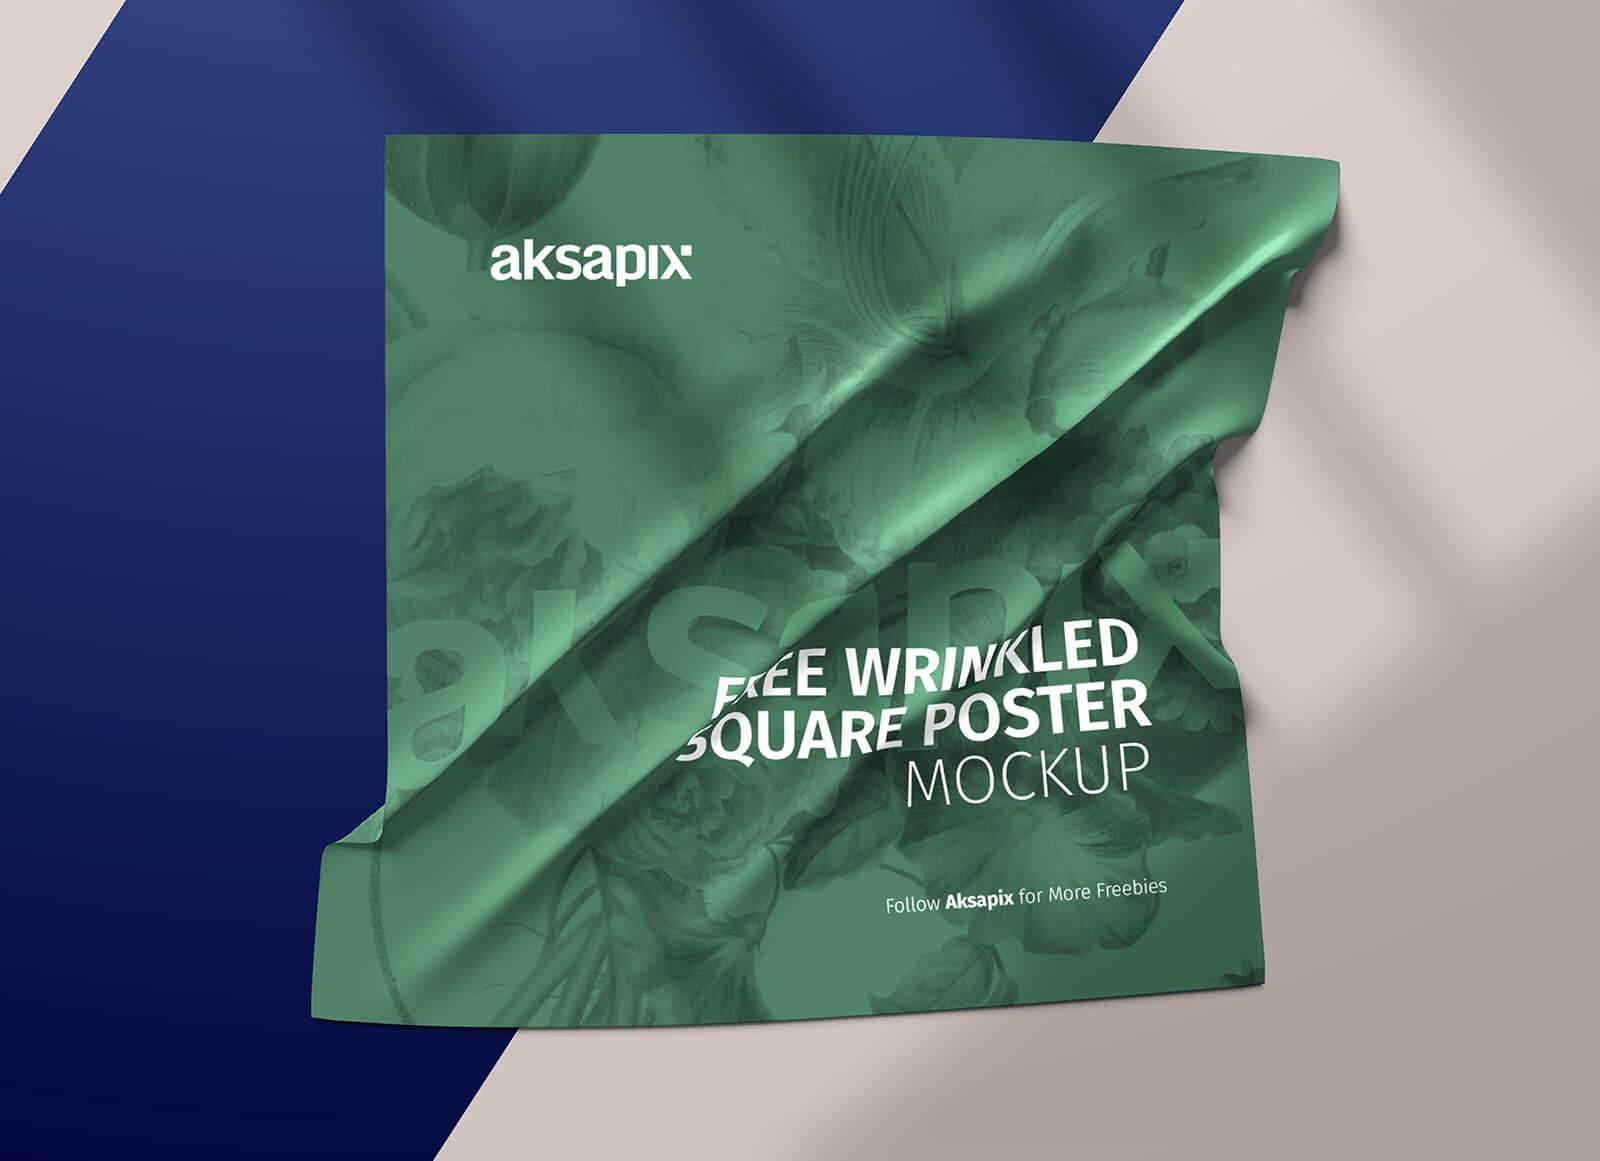 Free-Wrinkled-Square-Poster-Mockup-PSD